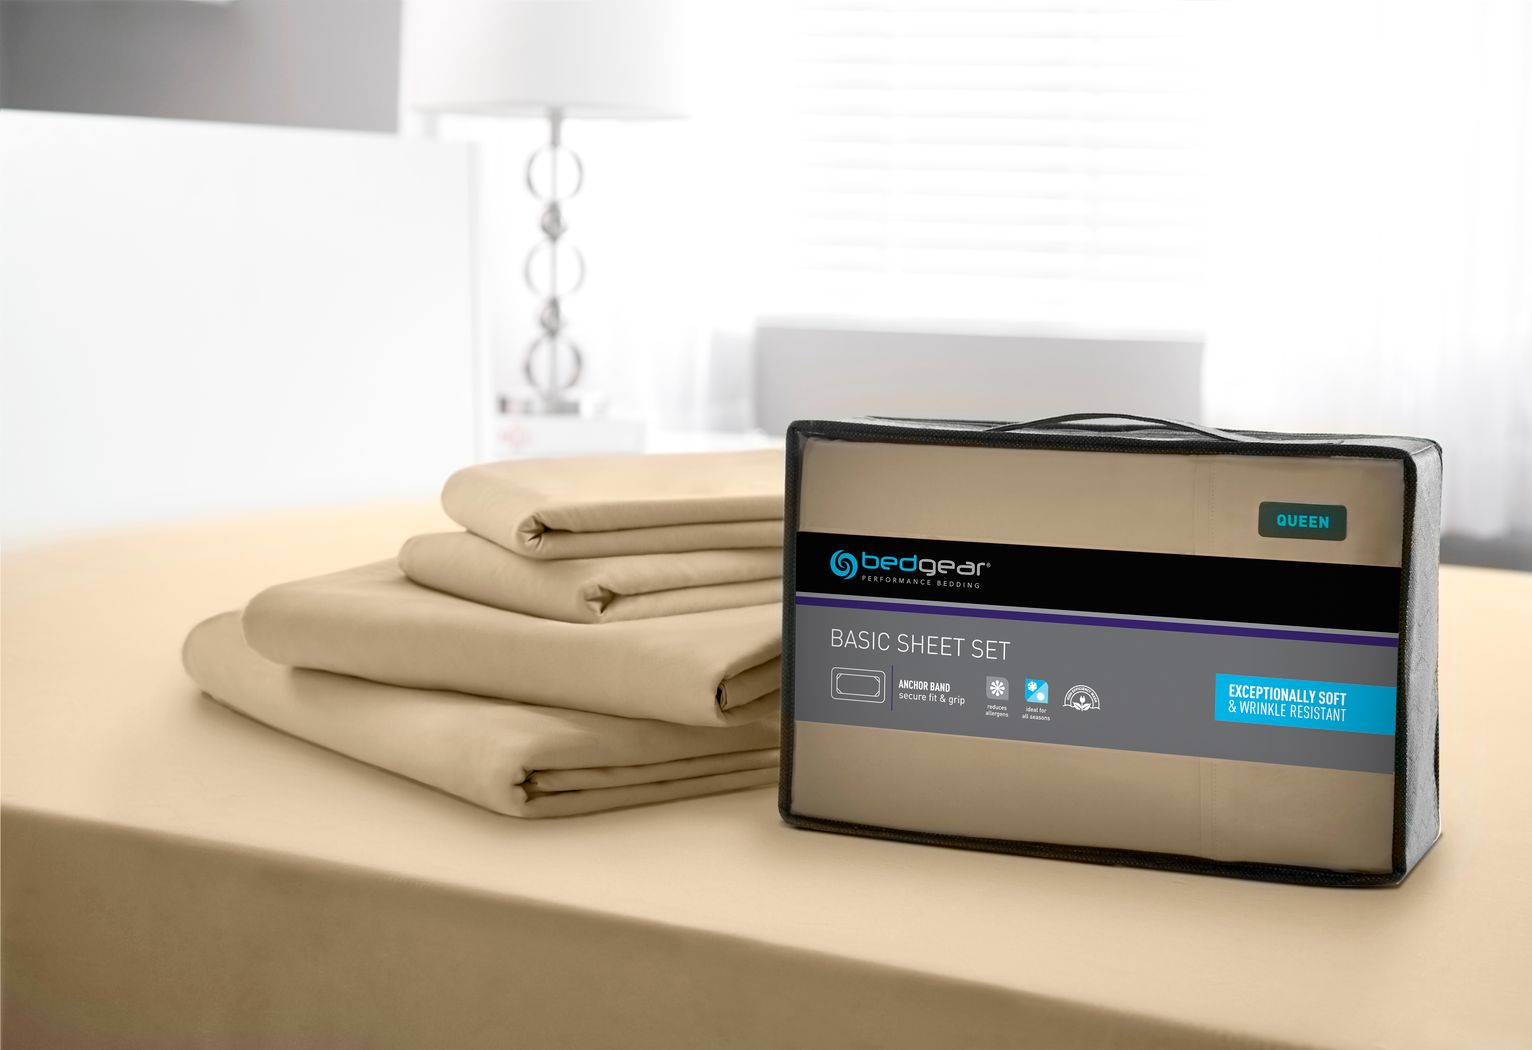 BG Basic Sand 4 Pc King Bed Sheet Set